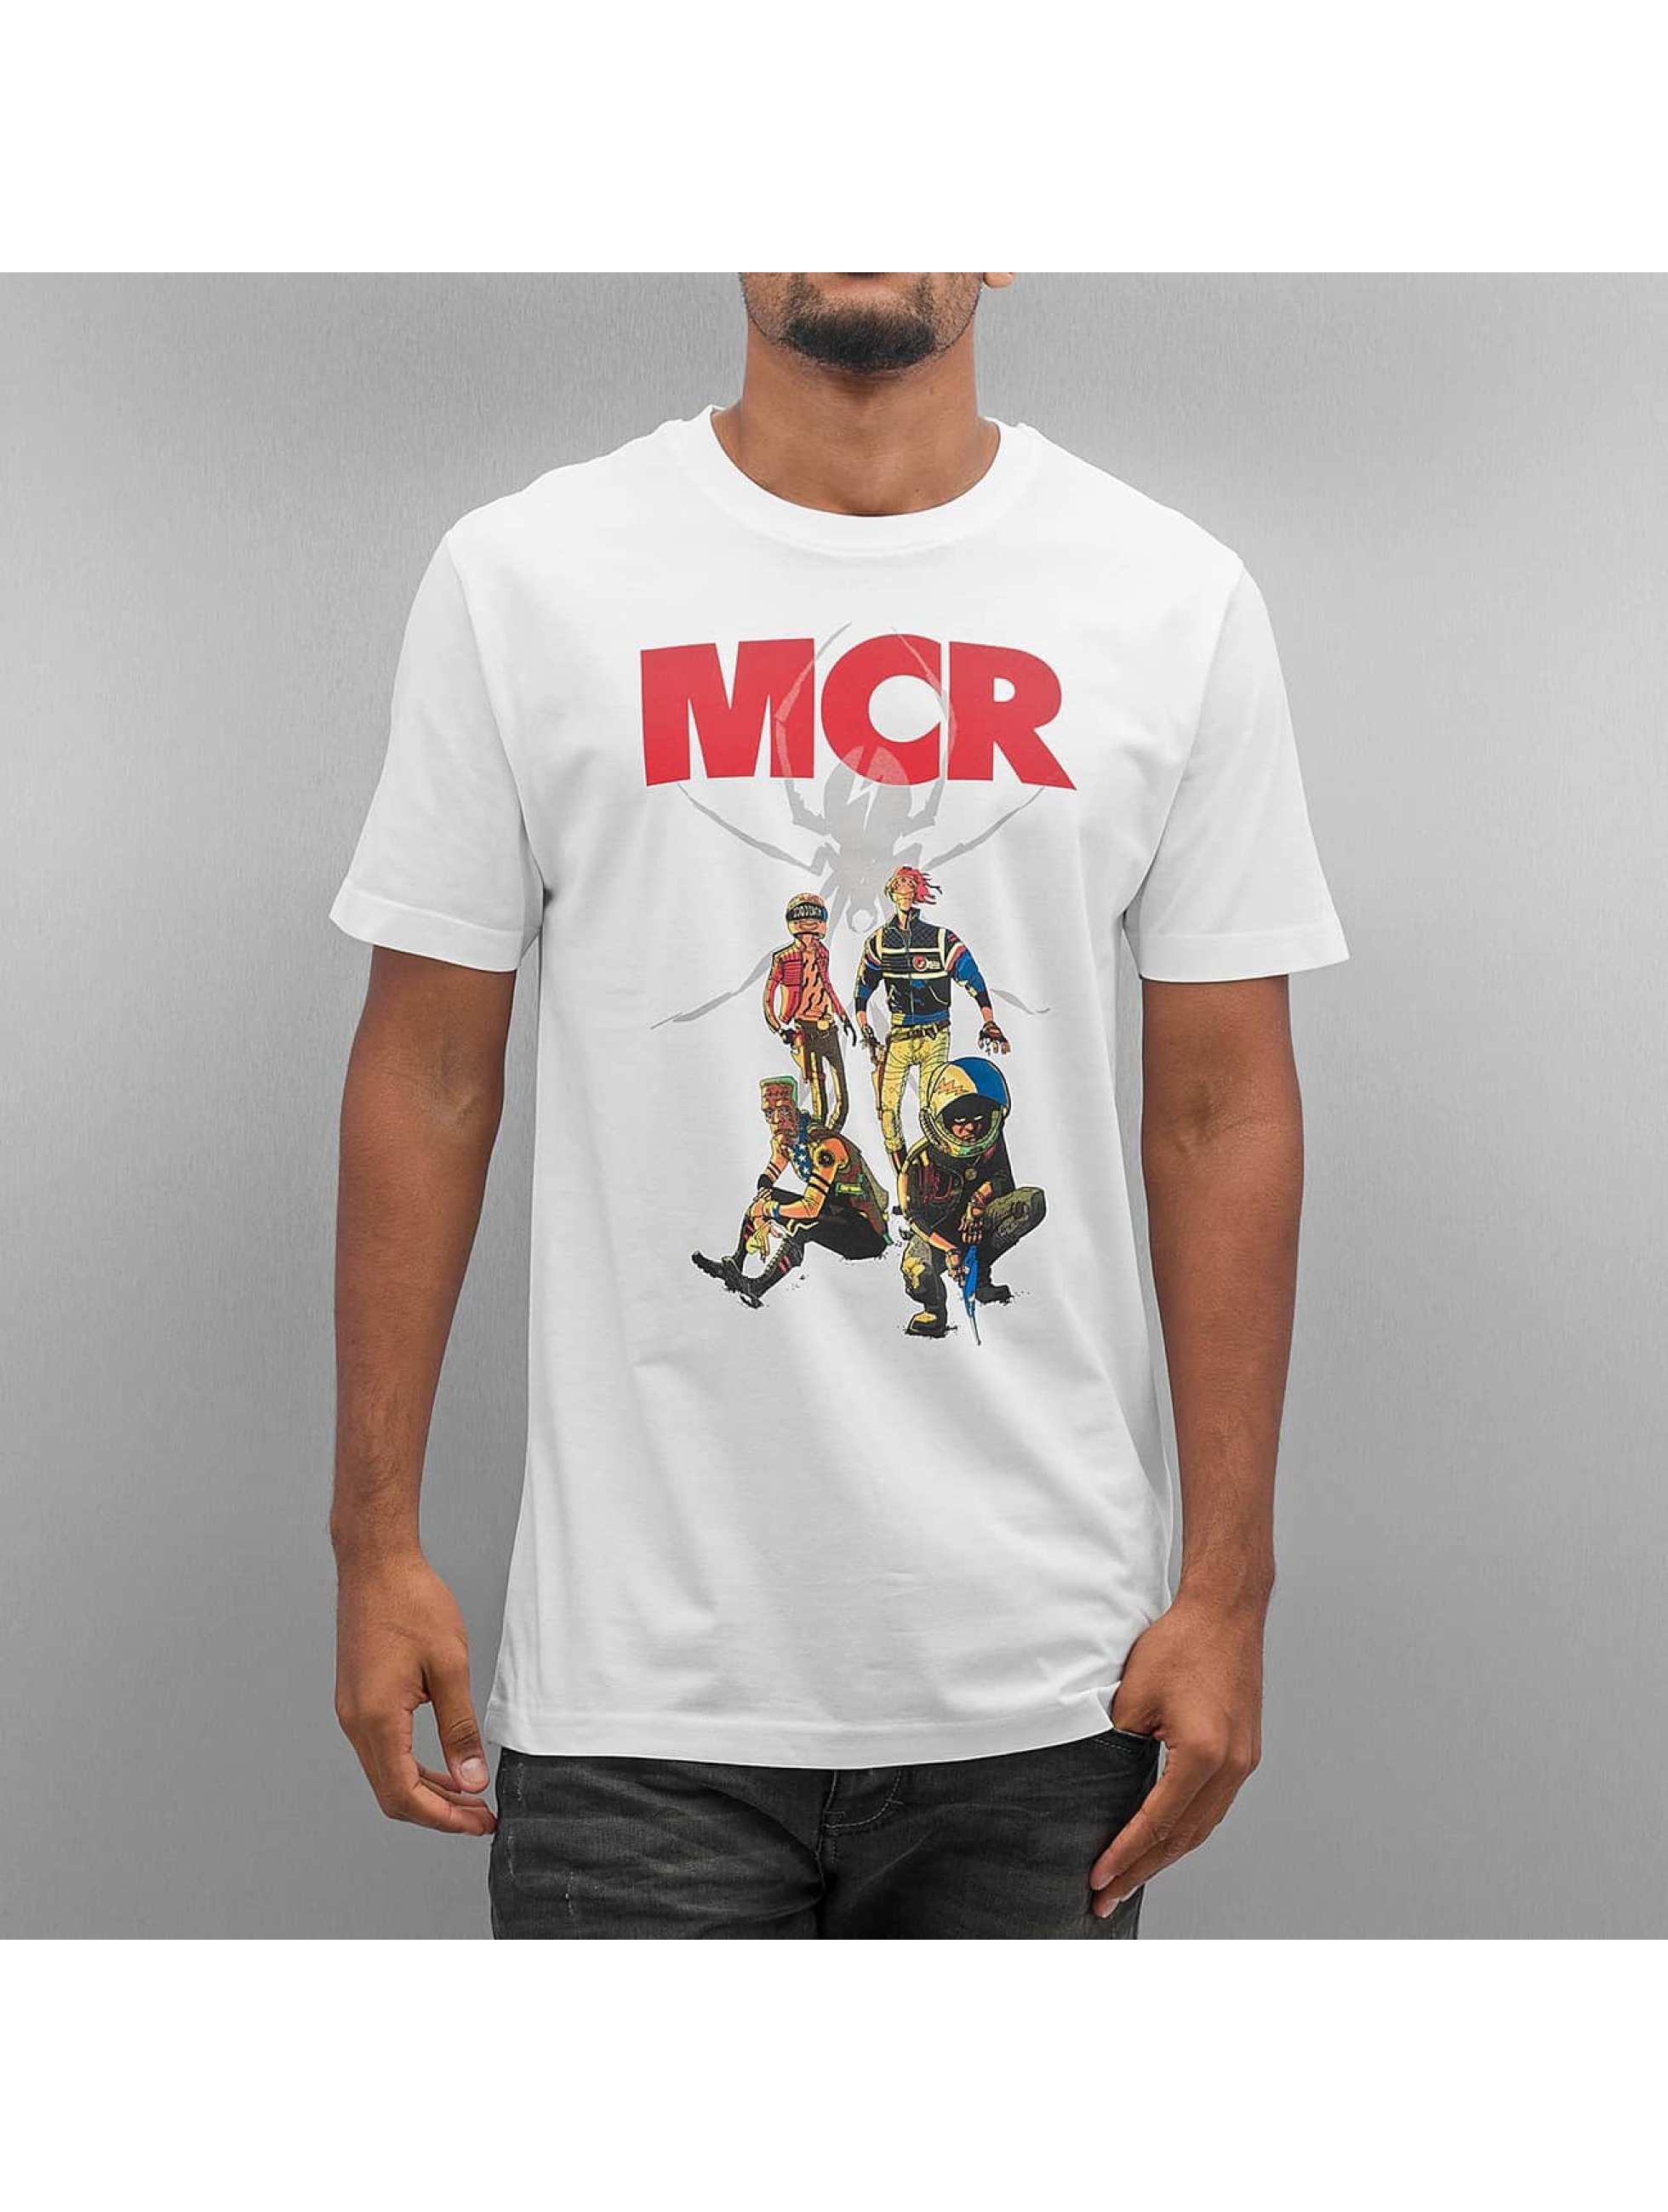 Mister Tee T-Shirt MY Chemical Romance Killjoys Pinup blanc